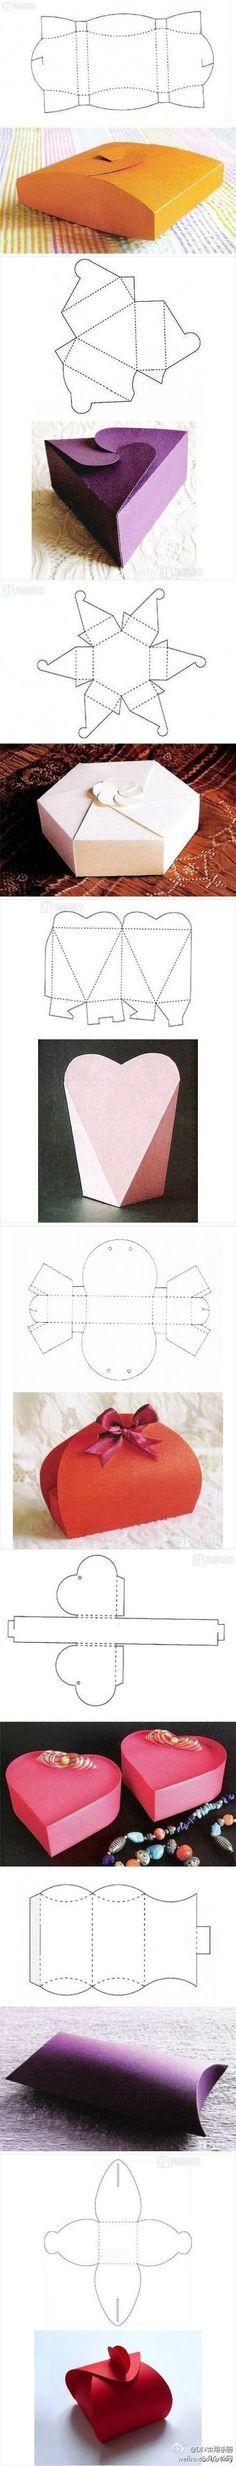 Arte & Reciclaje: Haz tus propias cajitas de regalo.